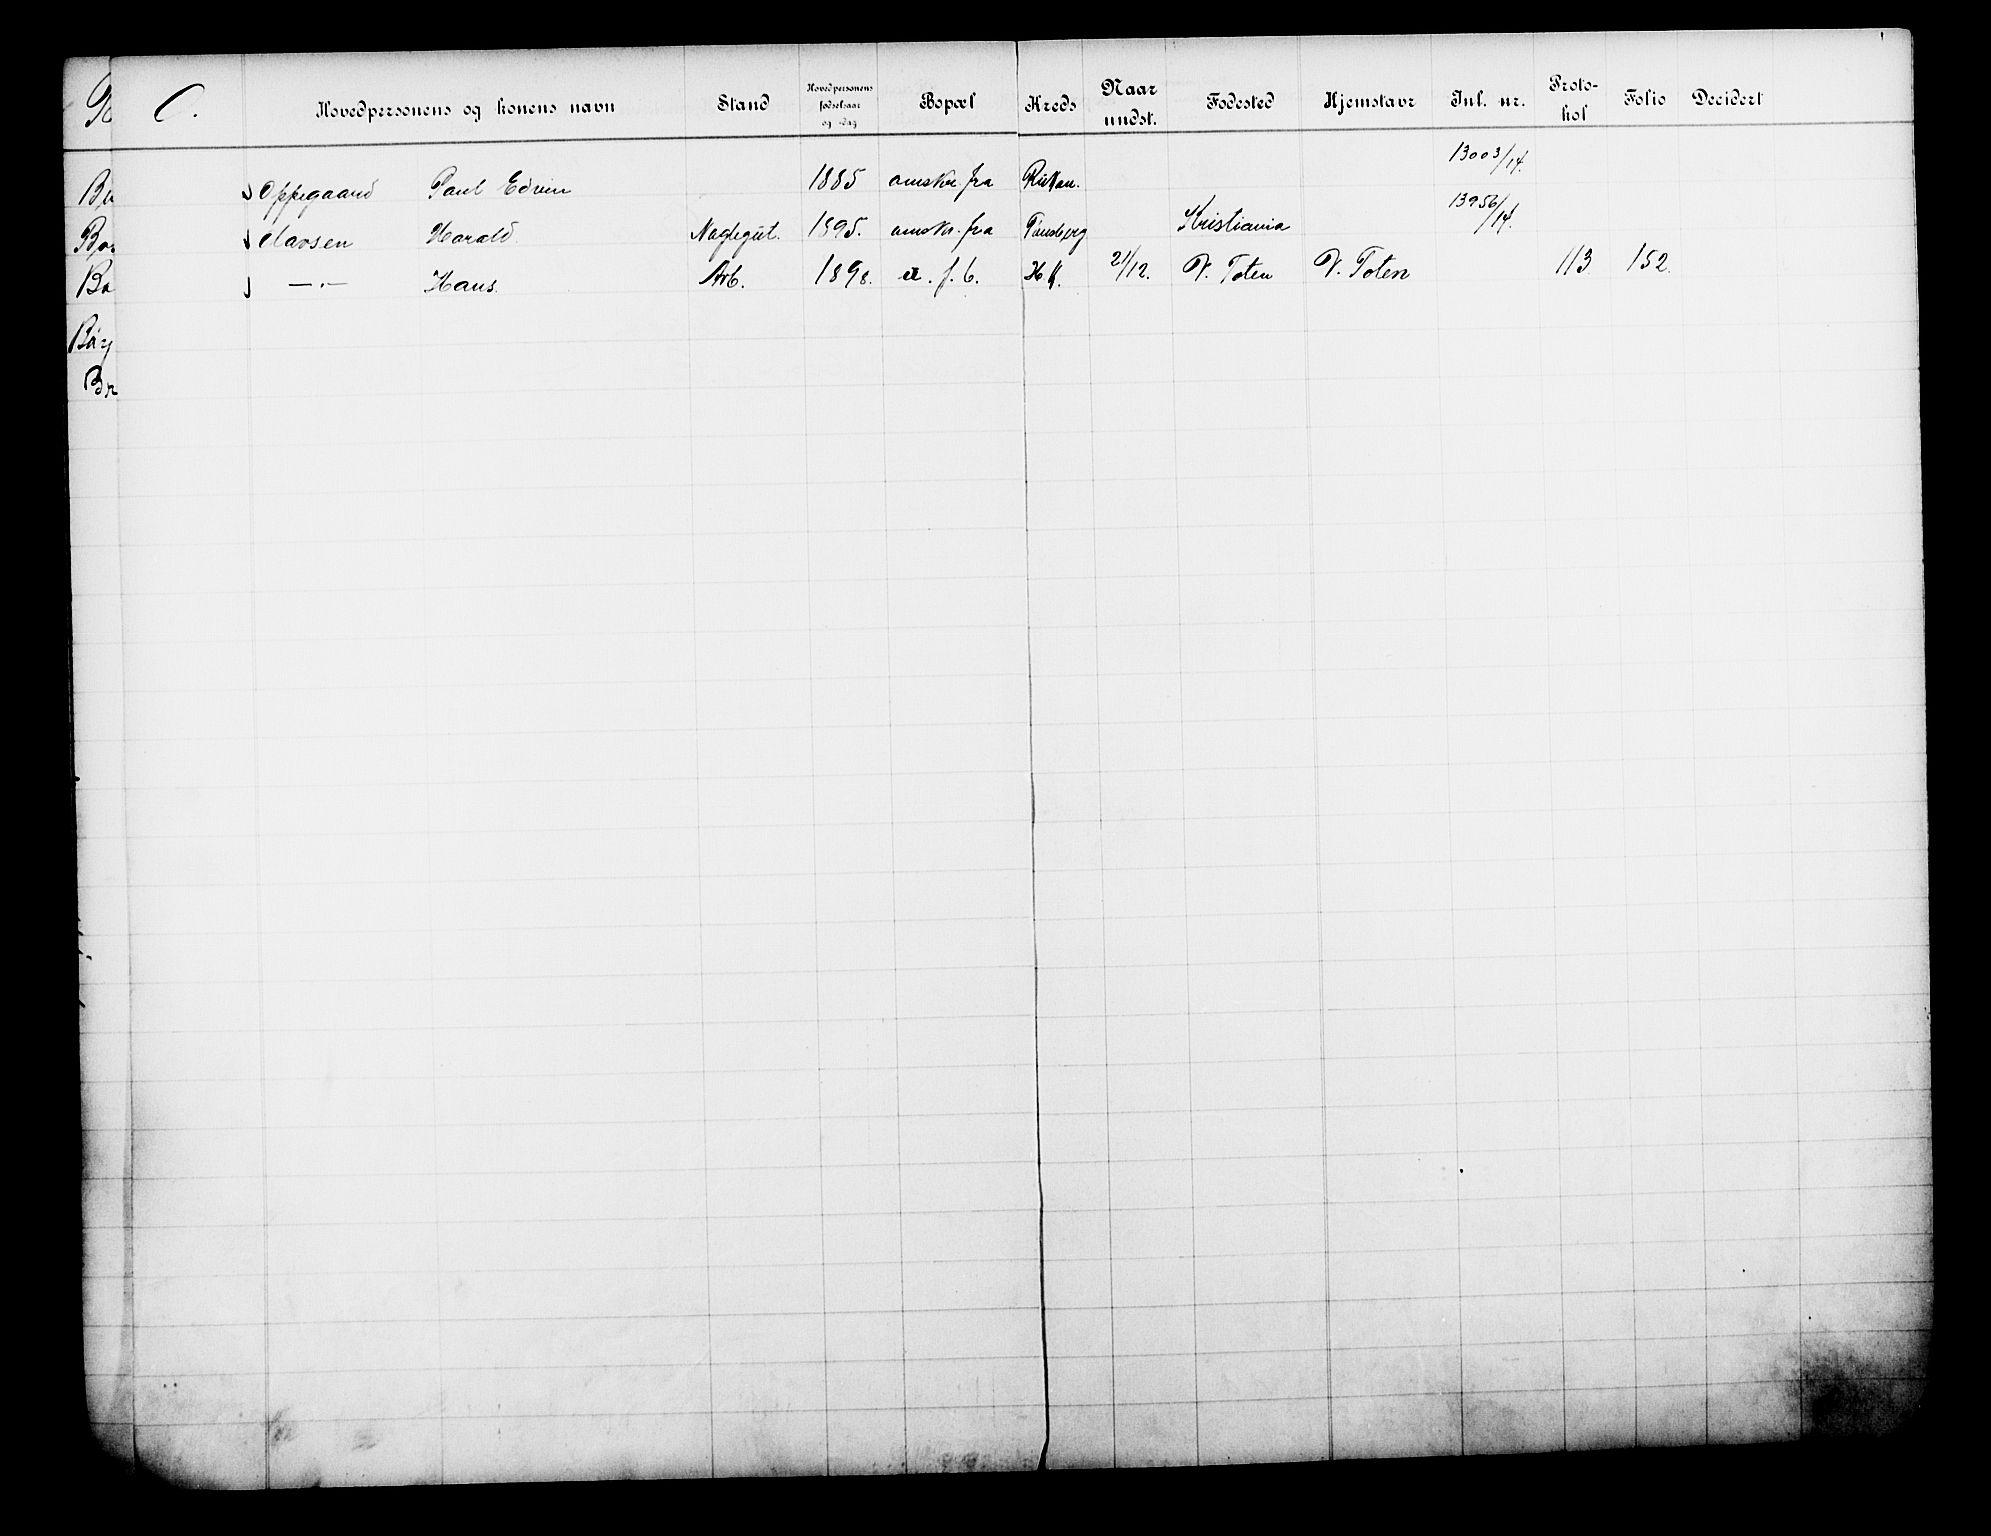 OBA, Fattigvesenet, Fb/L0033: Hjemstavnsregister, 1914, s. 256